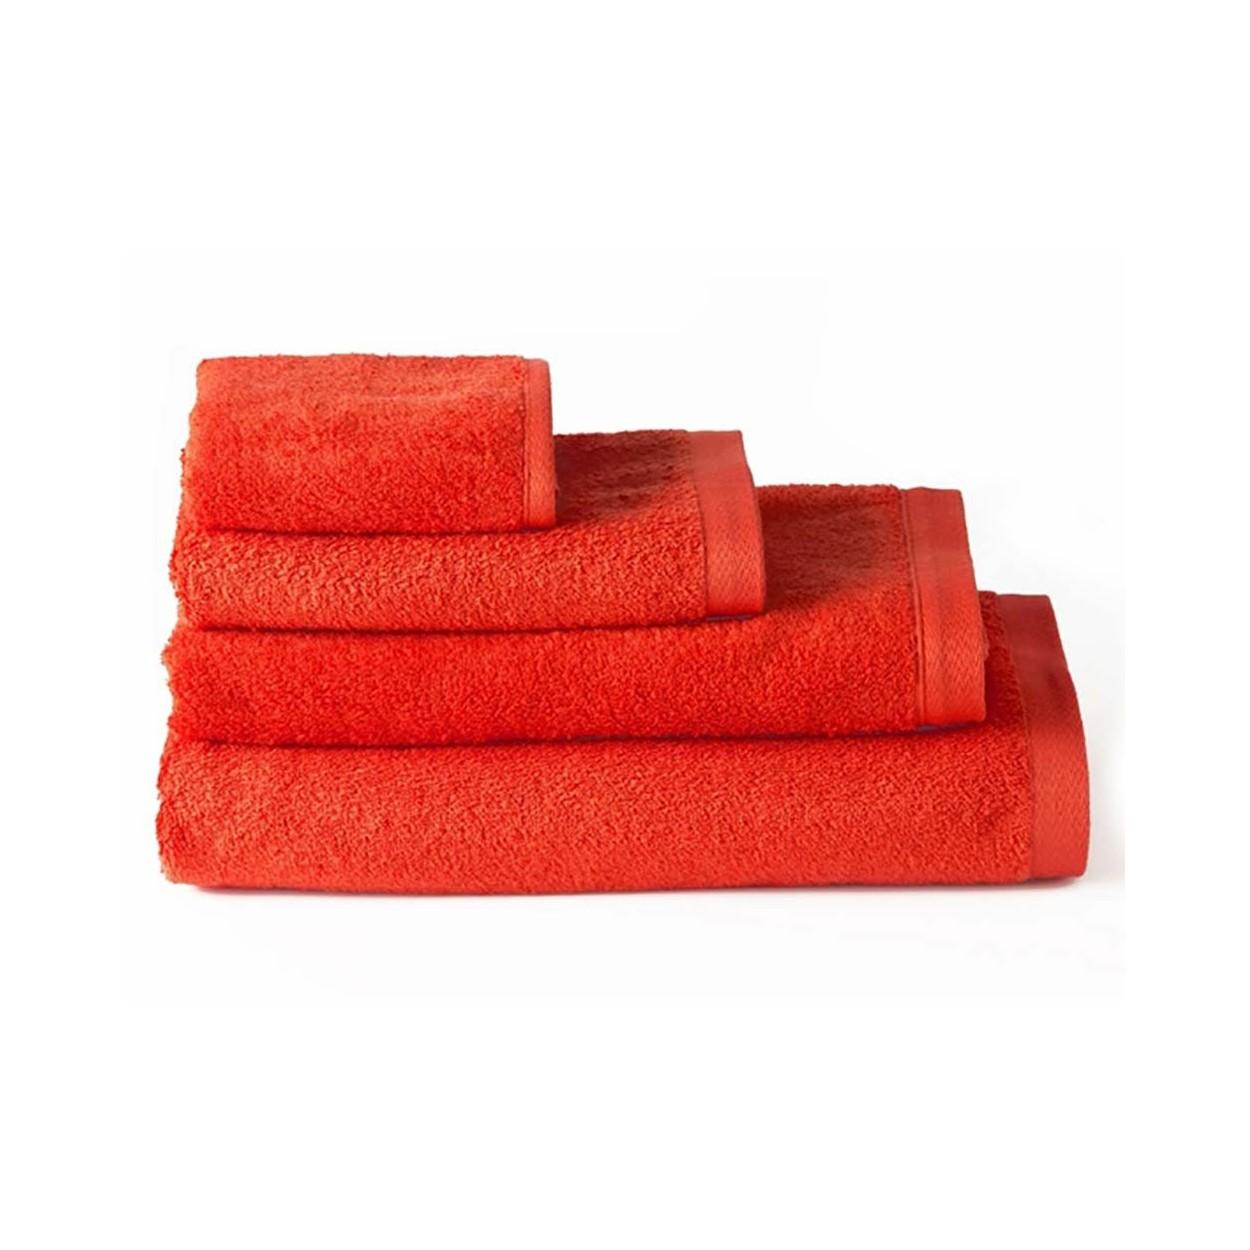 Toalla de ducha algod n roja 70x140 hogar y m s - Toallas de algodon ...